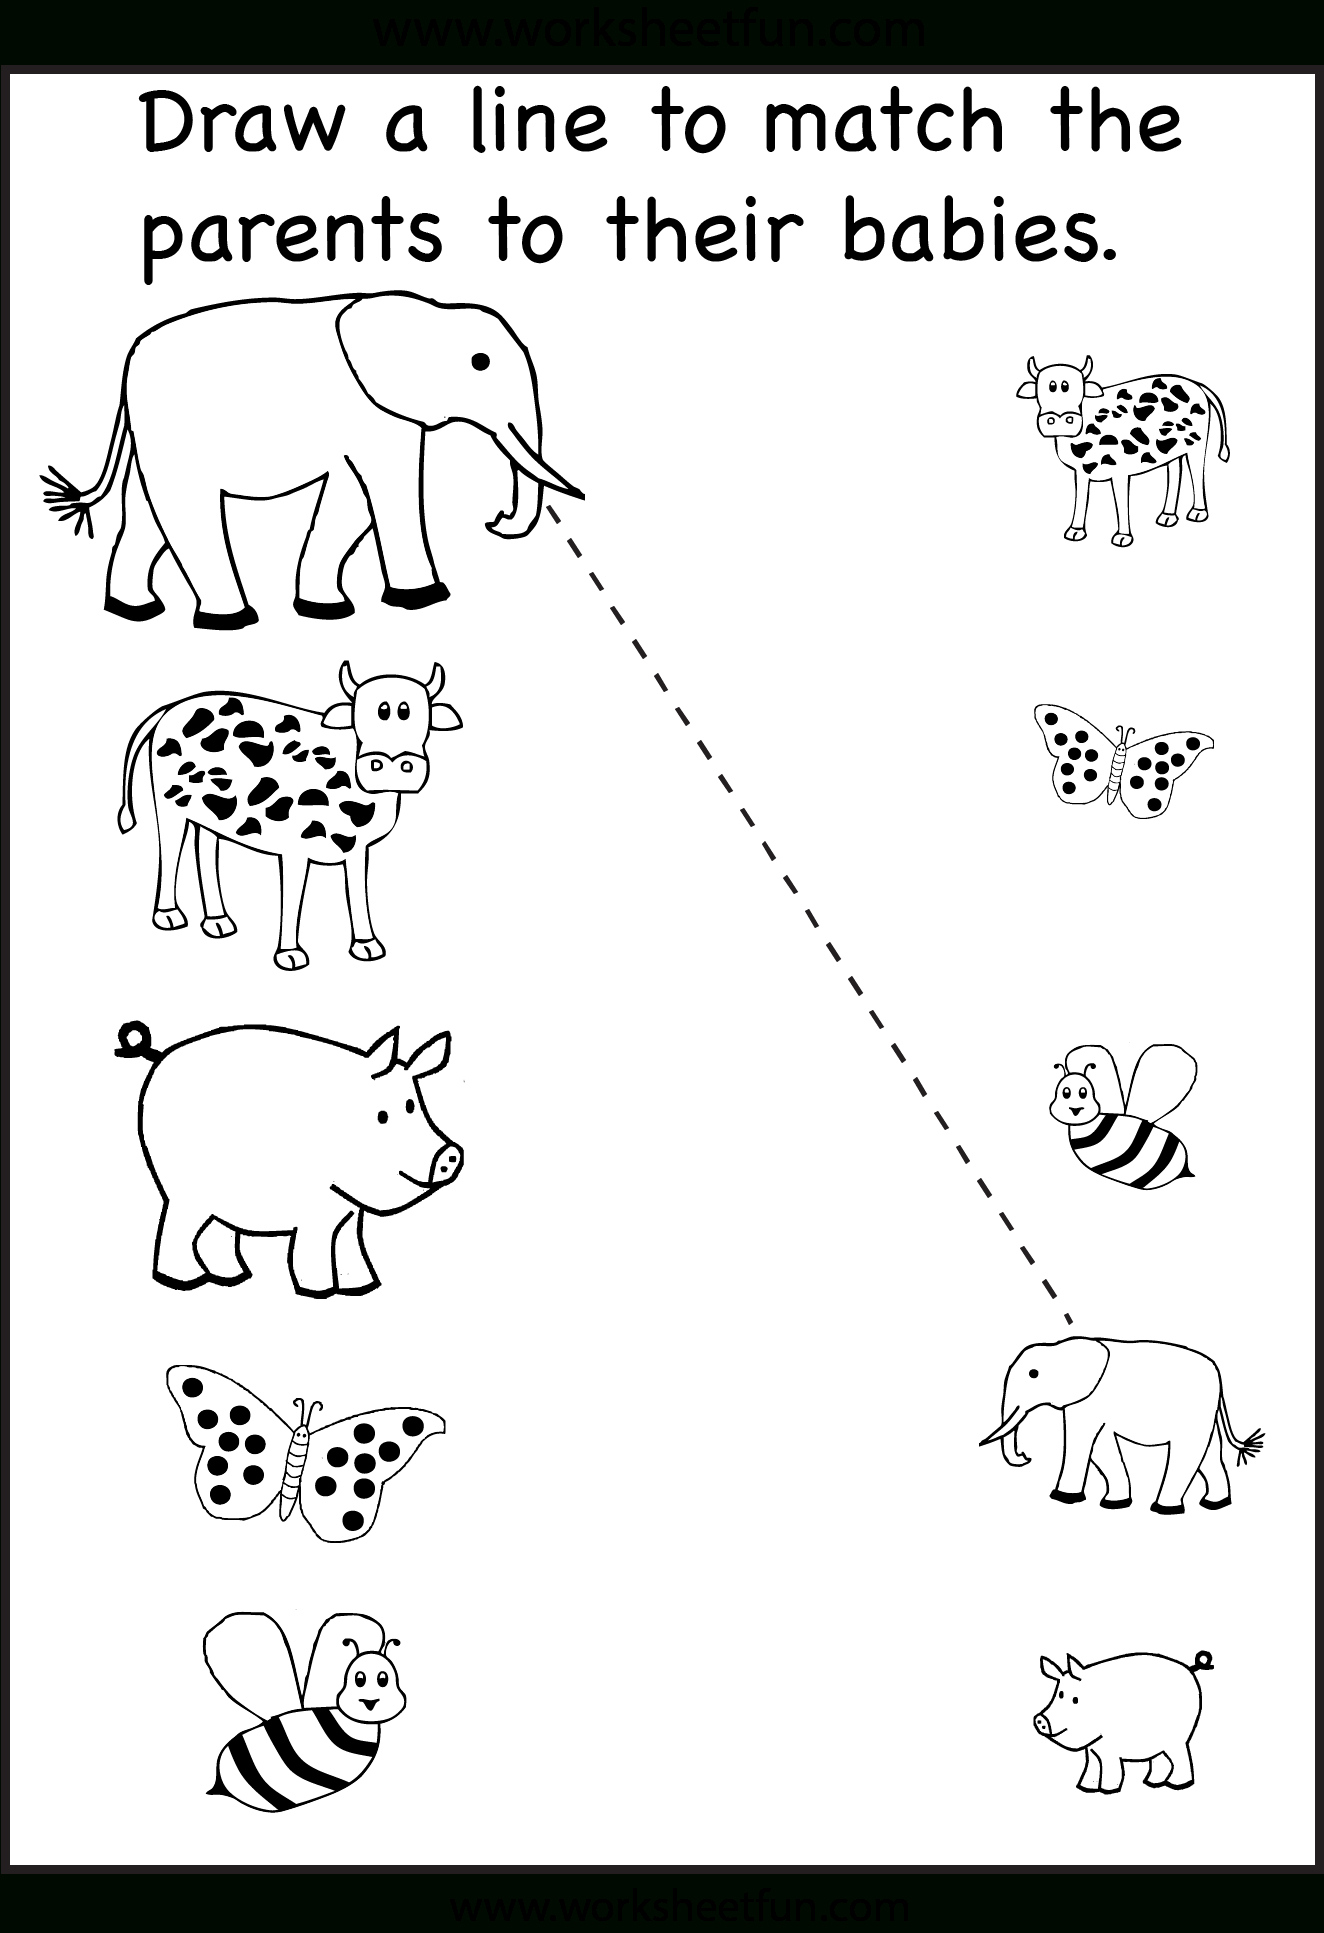 Preschool Matching Worksheet | Matching | Kindergarten Worksheets | Printable Matching Worksheets For Preschoolers